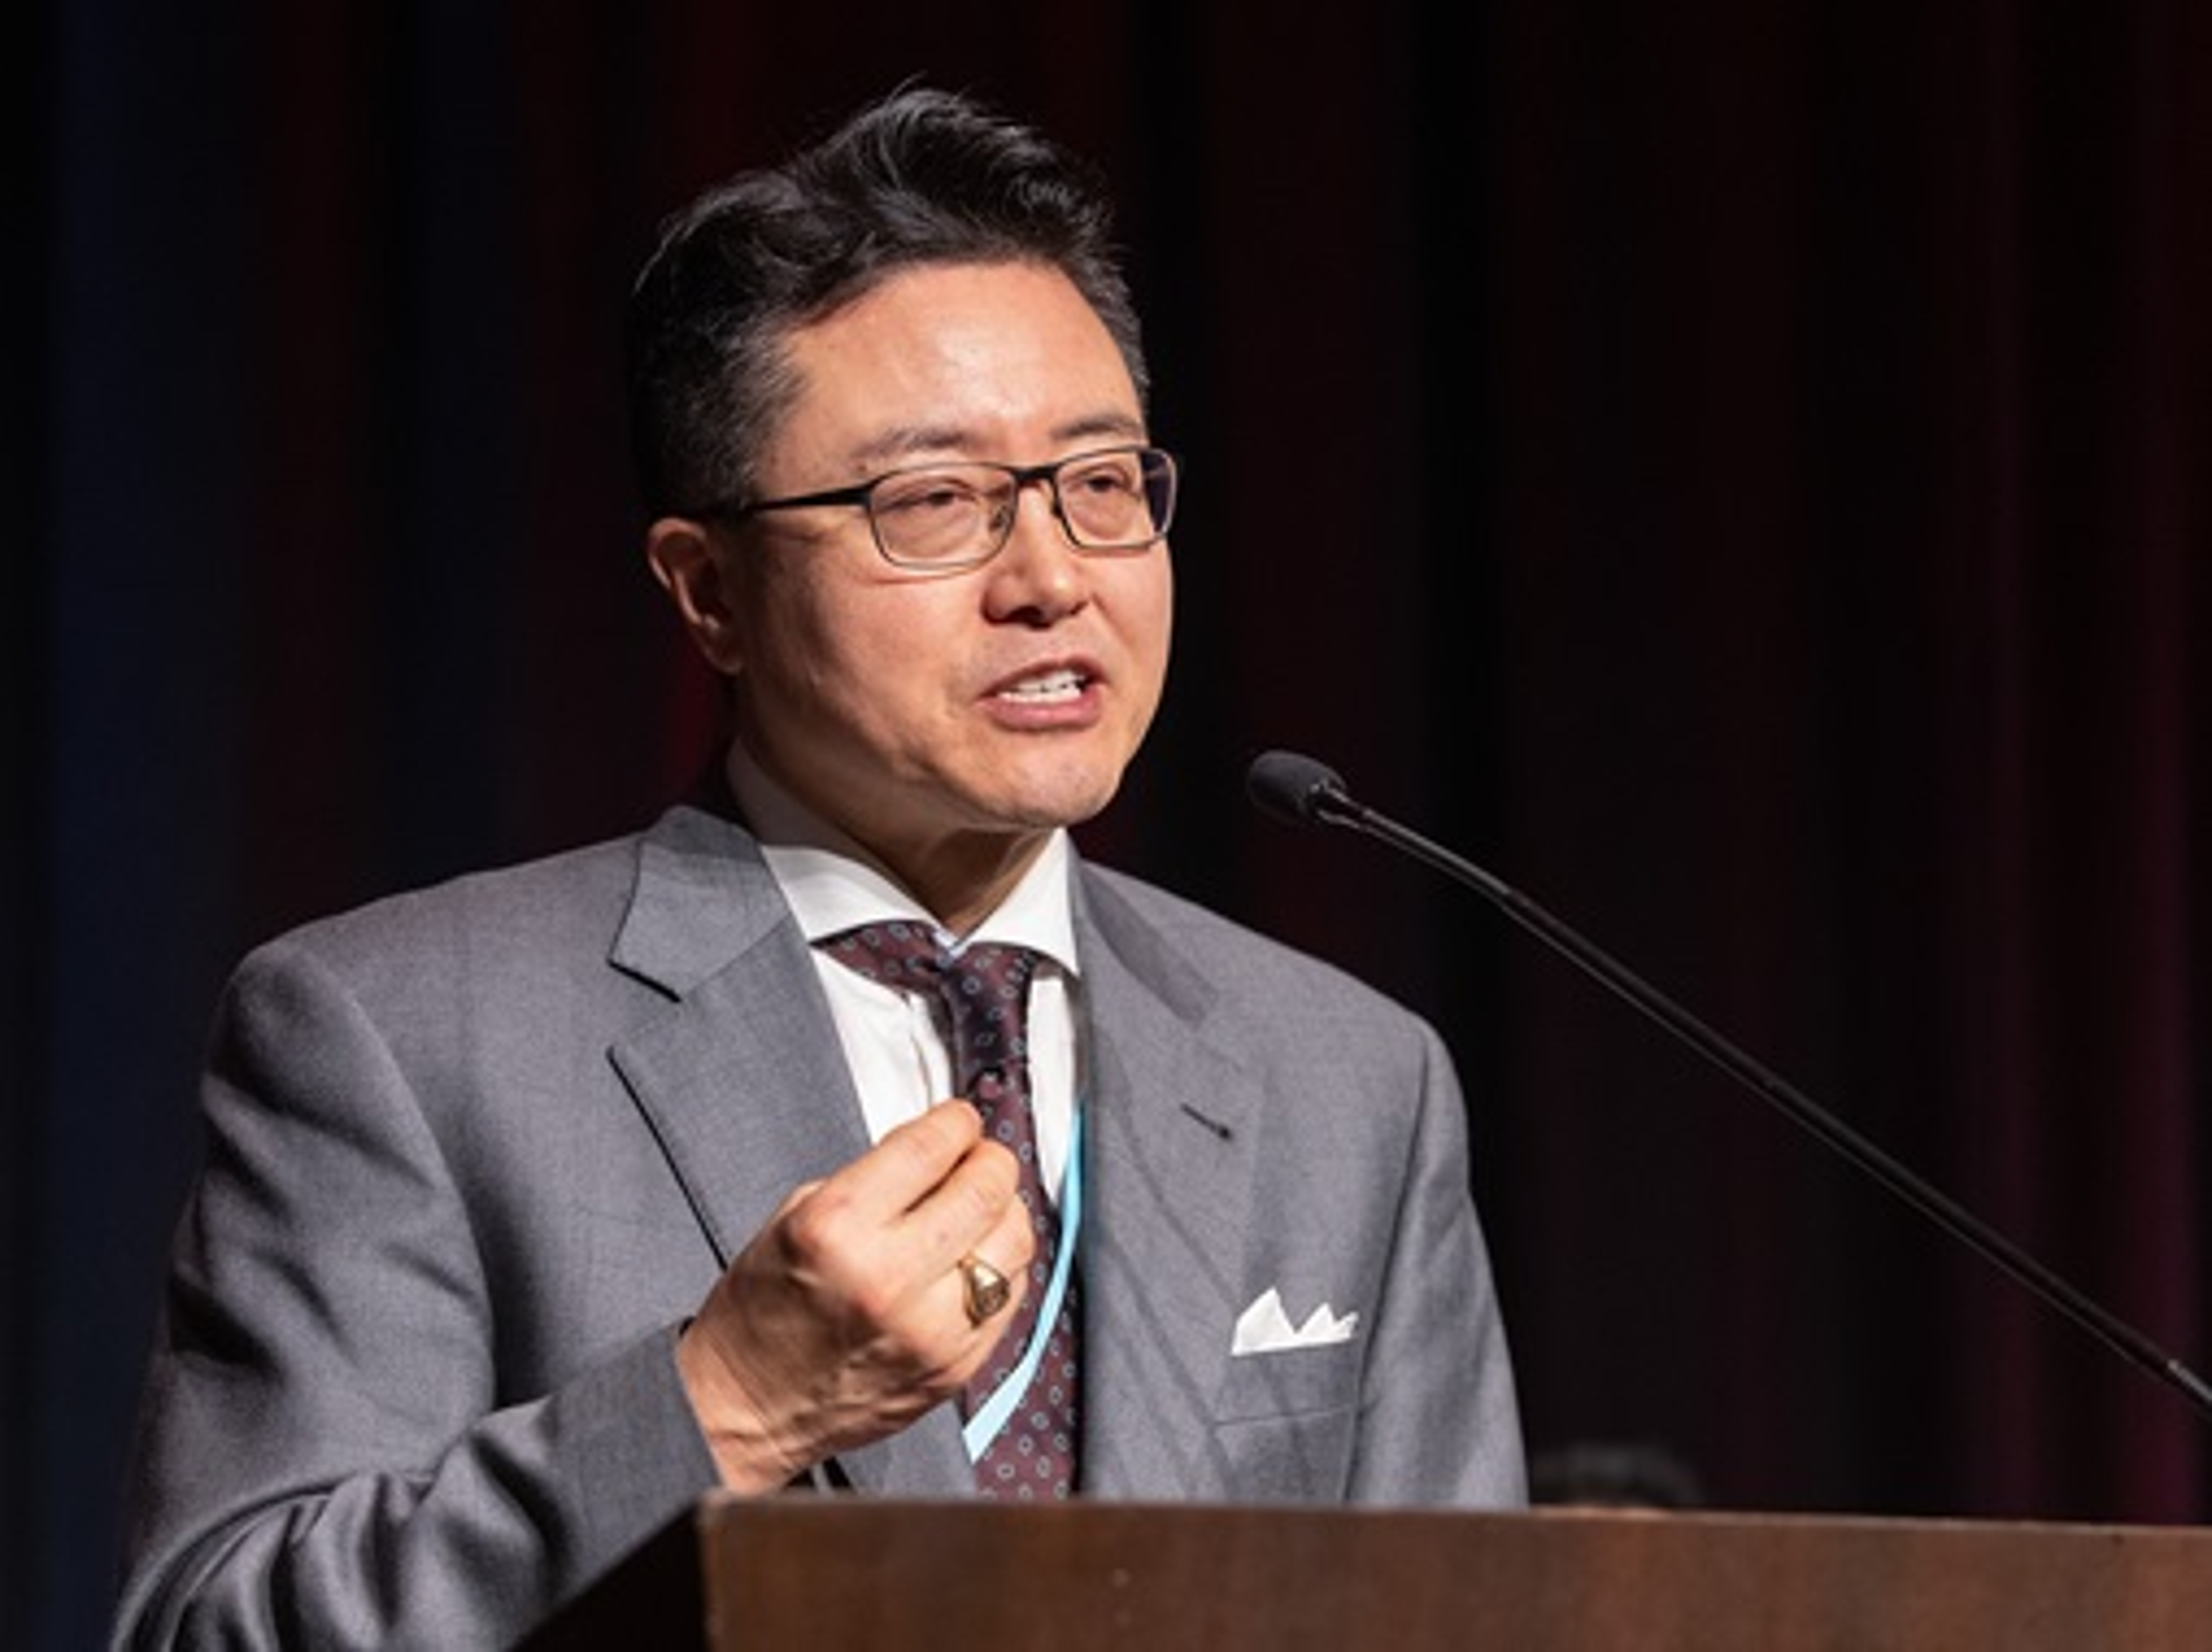 Rev. Paul Chang, Director Ejecutivo del Plan para el Ministerio Coreano. Foto Mike Dubose, Noticias MU.